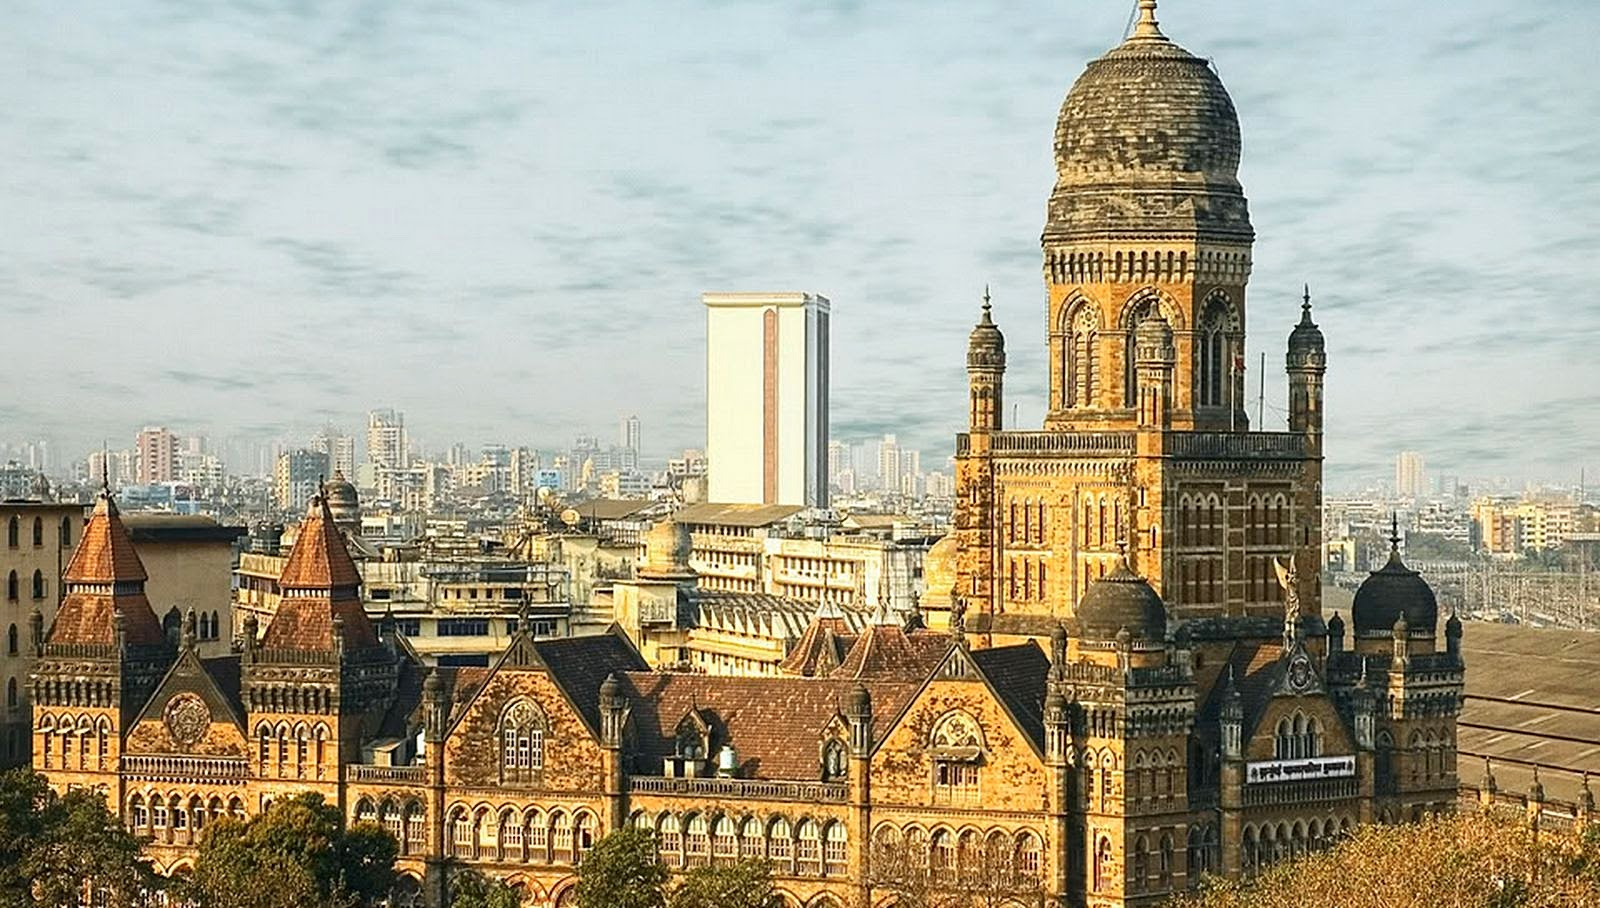 Garcia de Orta recebeu a cidade de Bombaim como pr